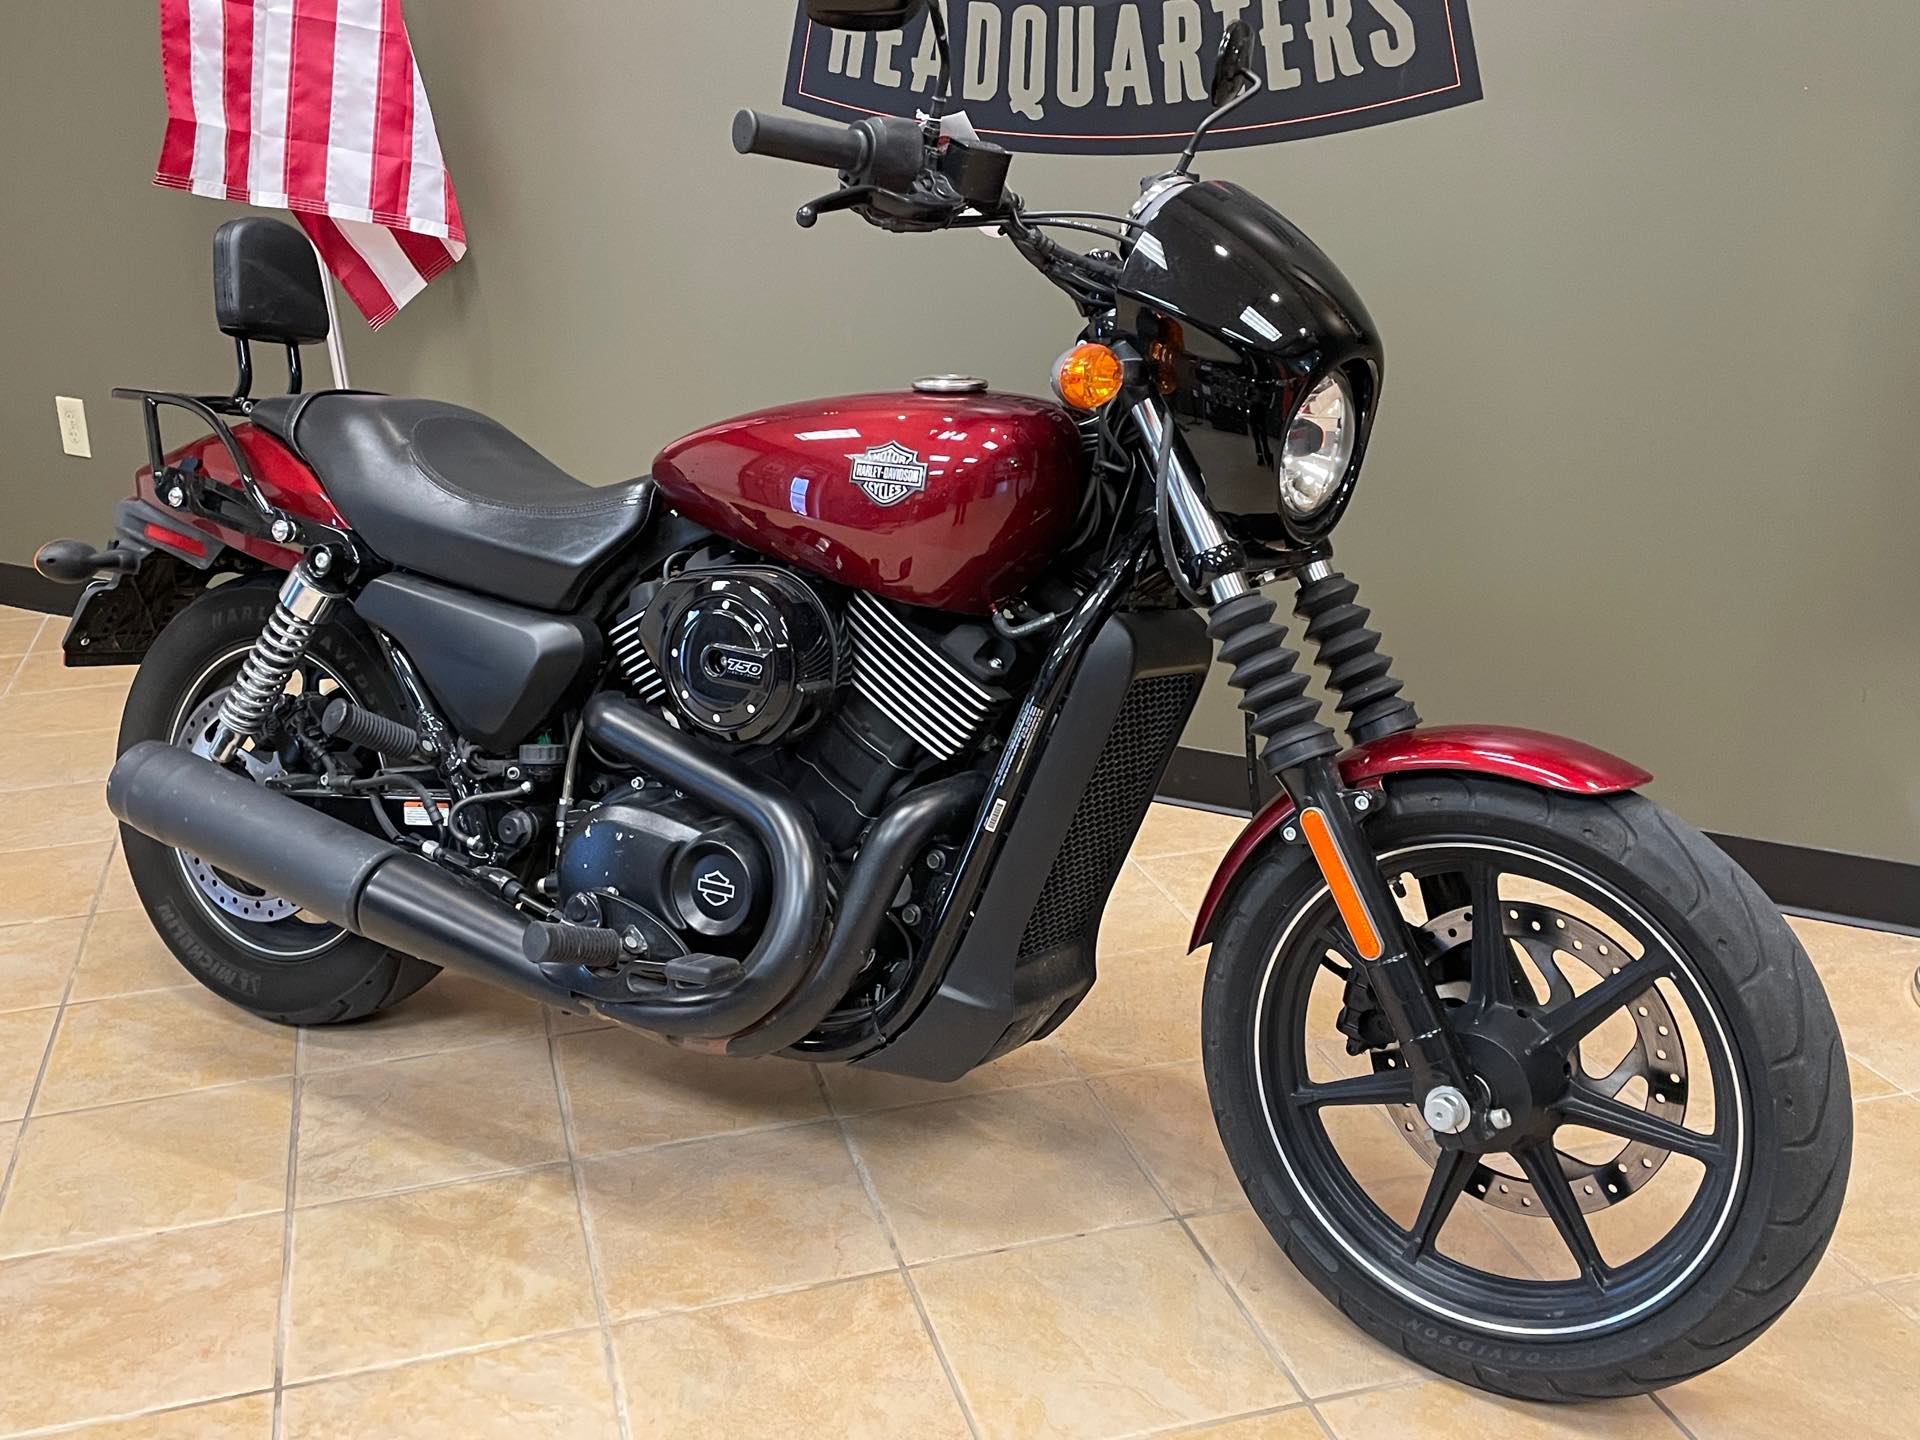 2016 Harley-Davidson Street 750 at Loess Hills Harley-Davidson